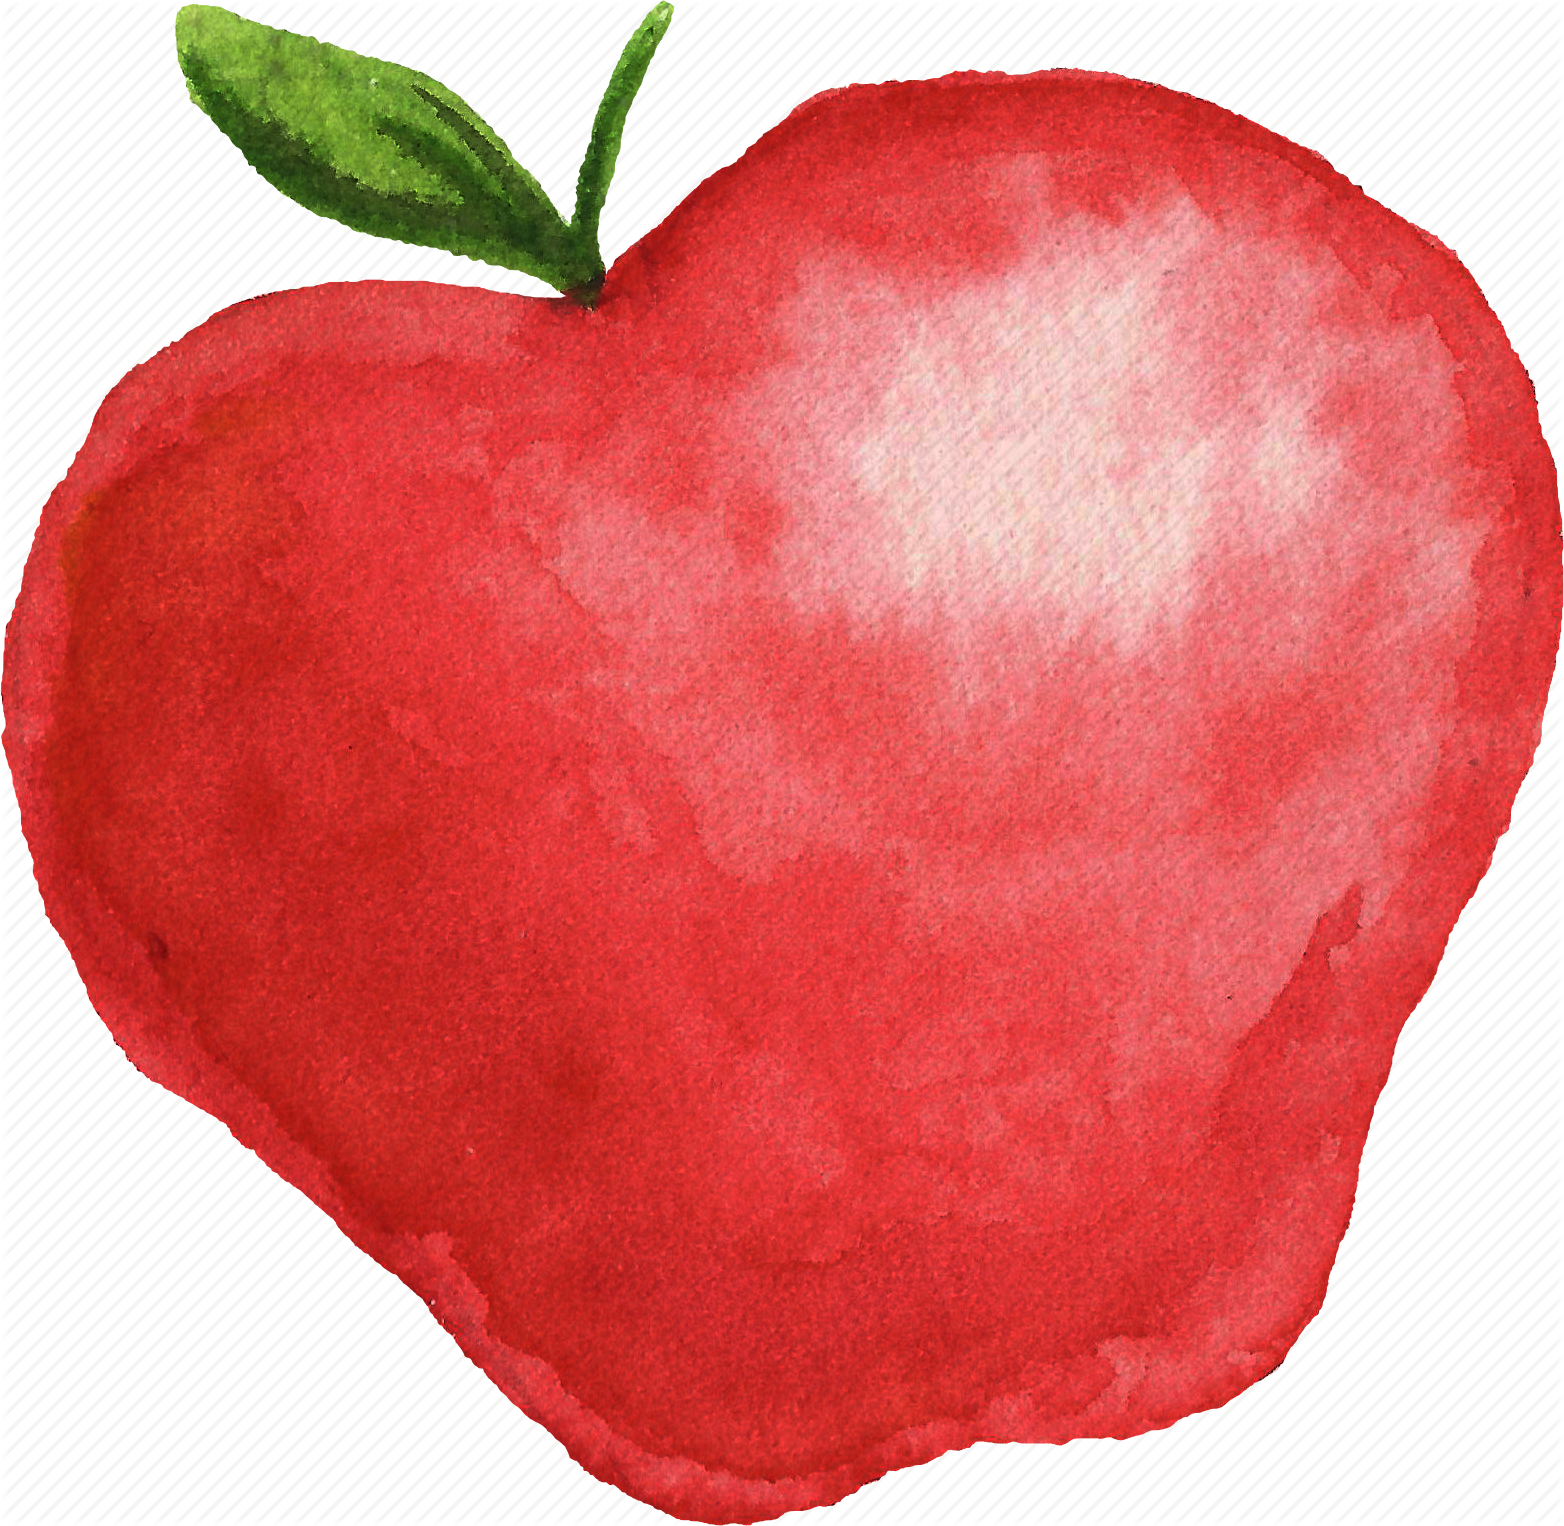 1564x1526 Apple, Cuisine, Food, Fruit, Fruits, Watercolor, Watercolors Icon